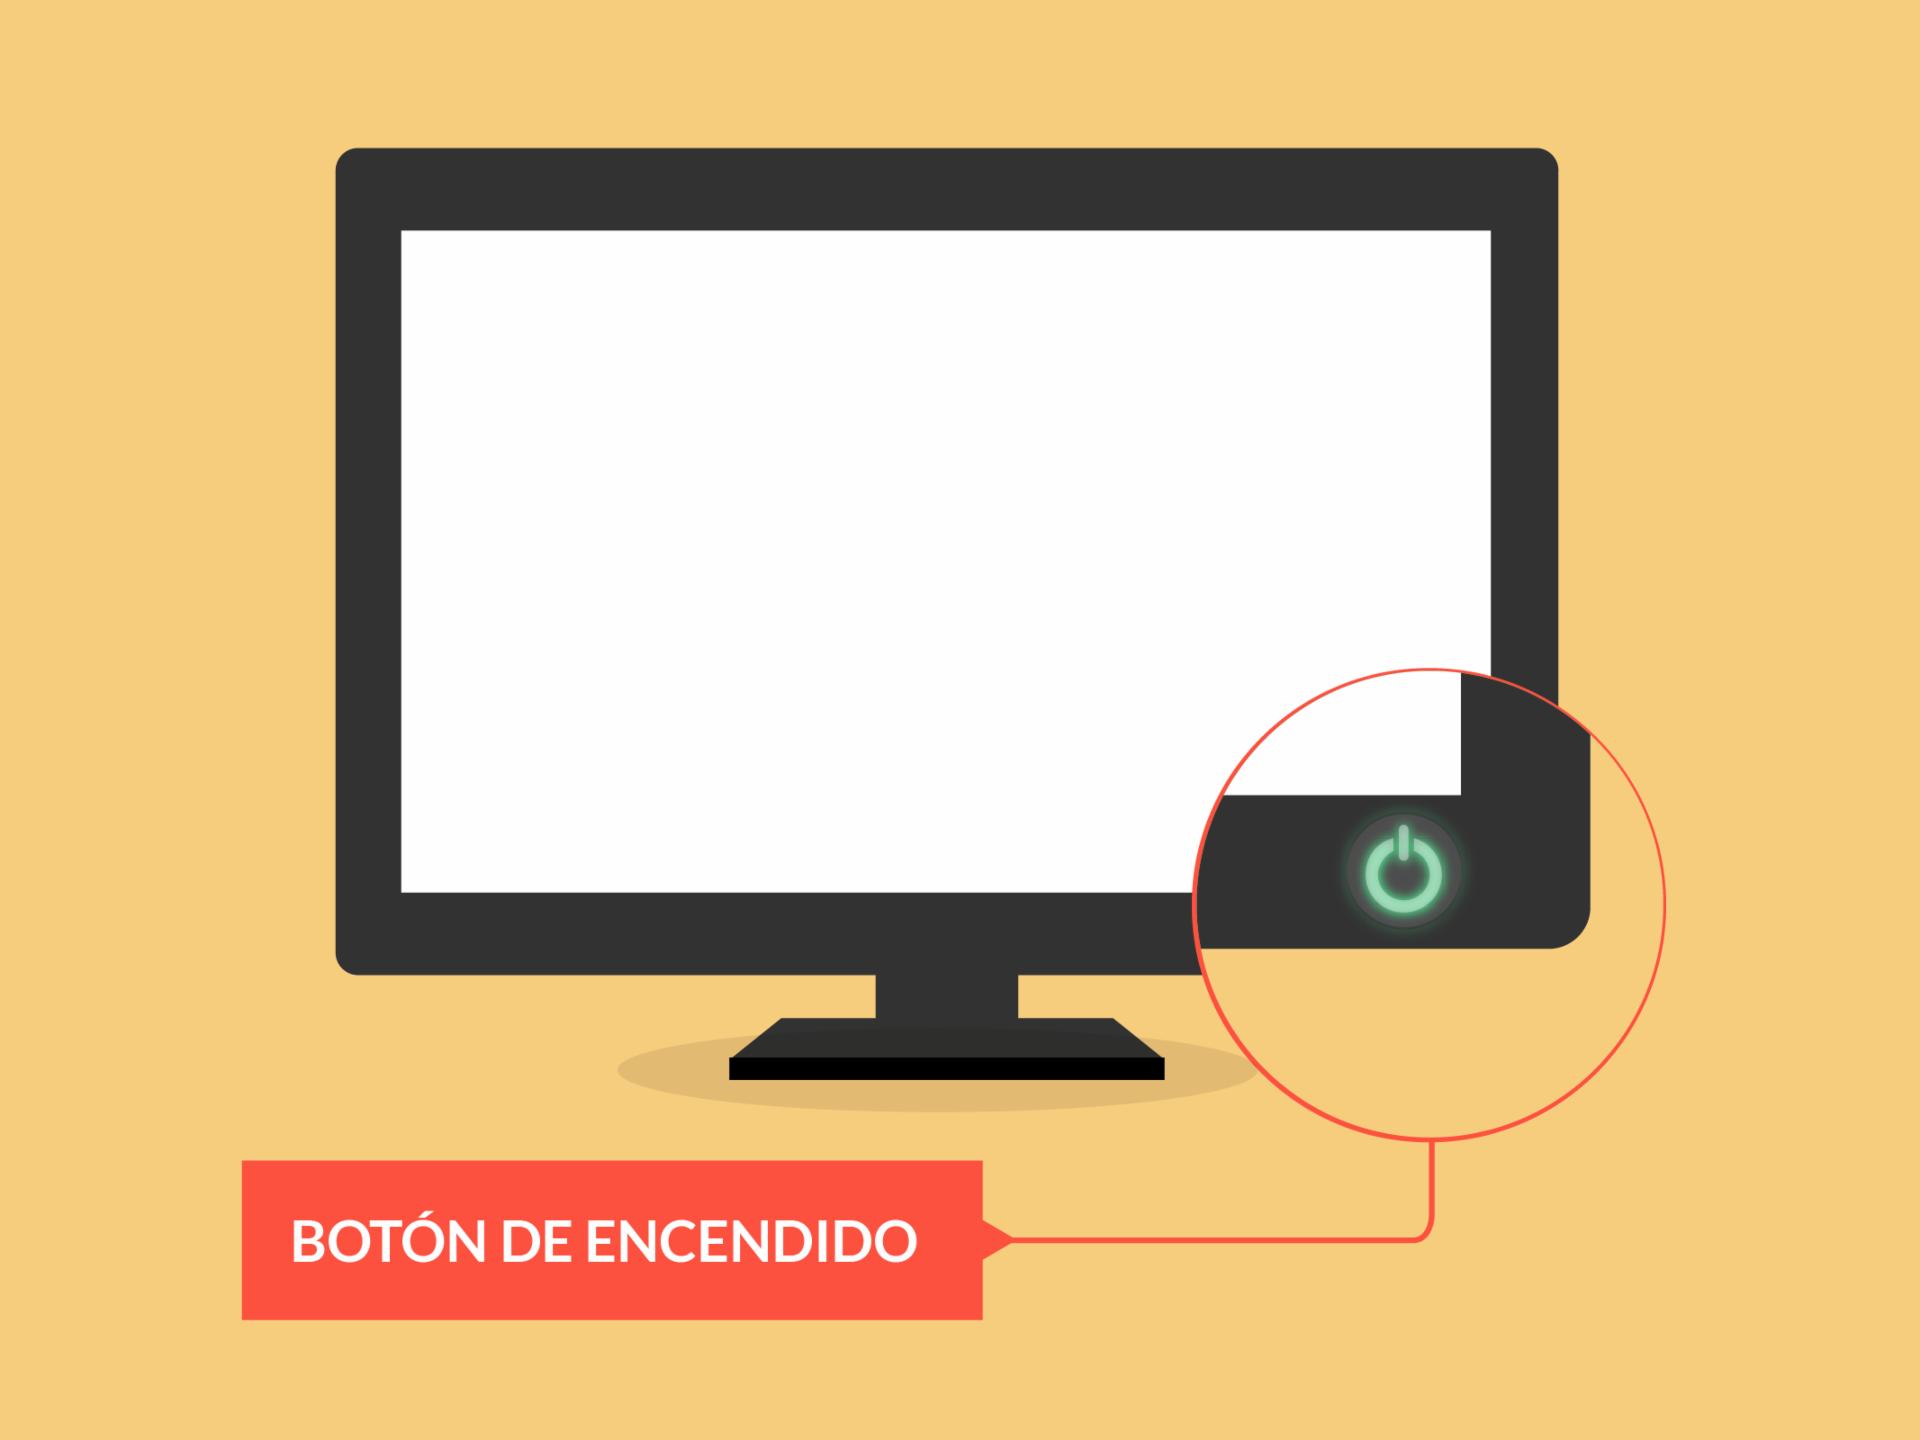 Botón de encendido de una pantalla o monitor de un computador de escritorio.